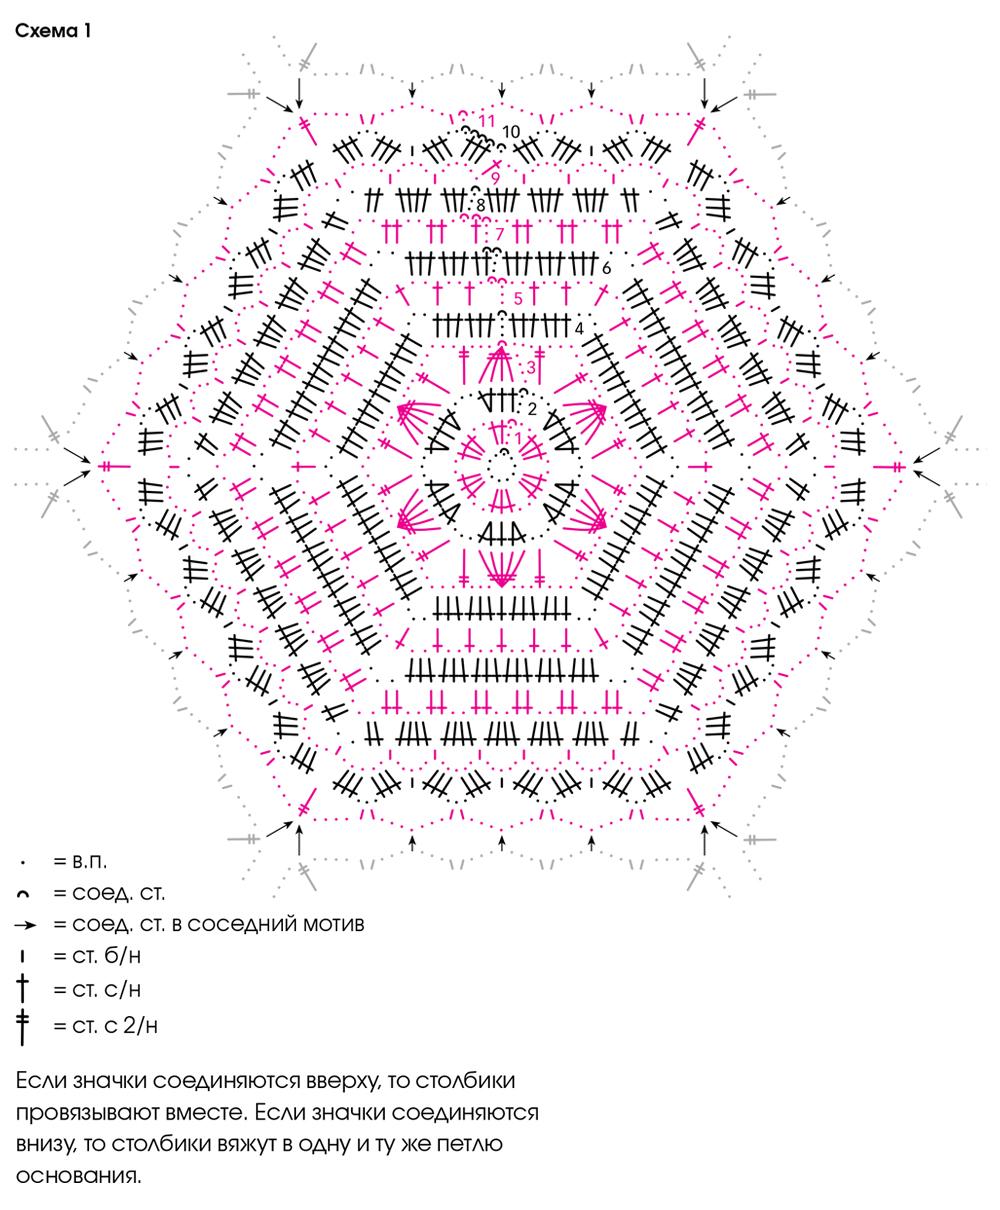 Кардиган из ажурных шестиугольников